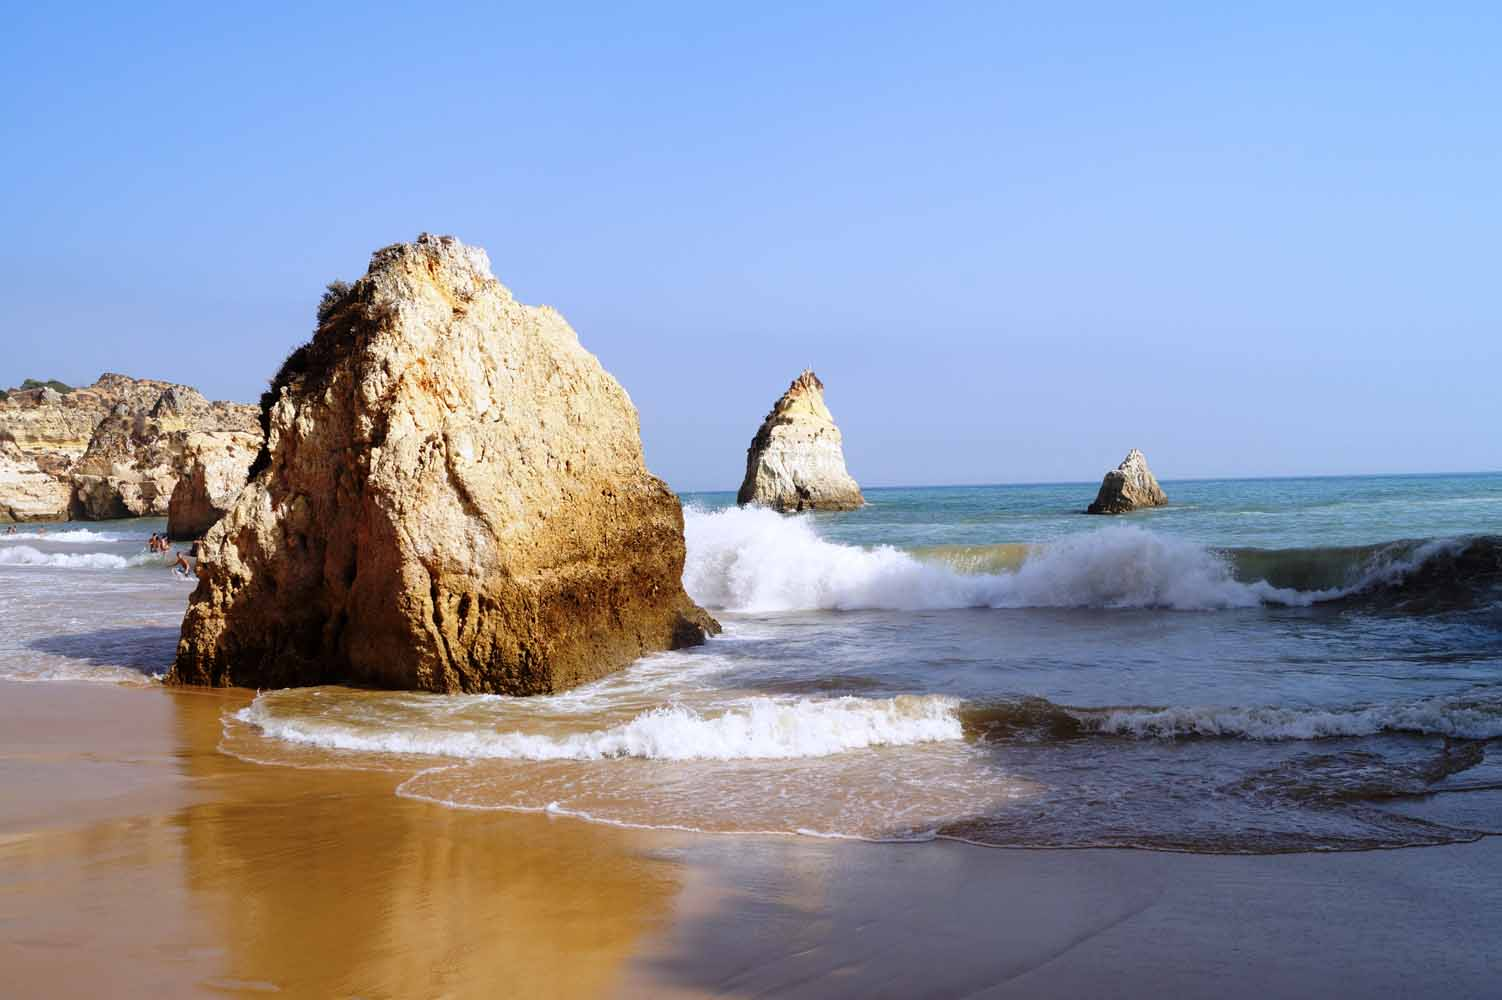 Reiseblogger Lieblingsort Portugal mit Kindern - Urlaub in Portugal mit Kindern